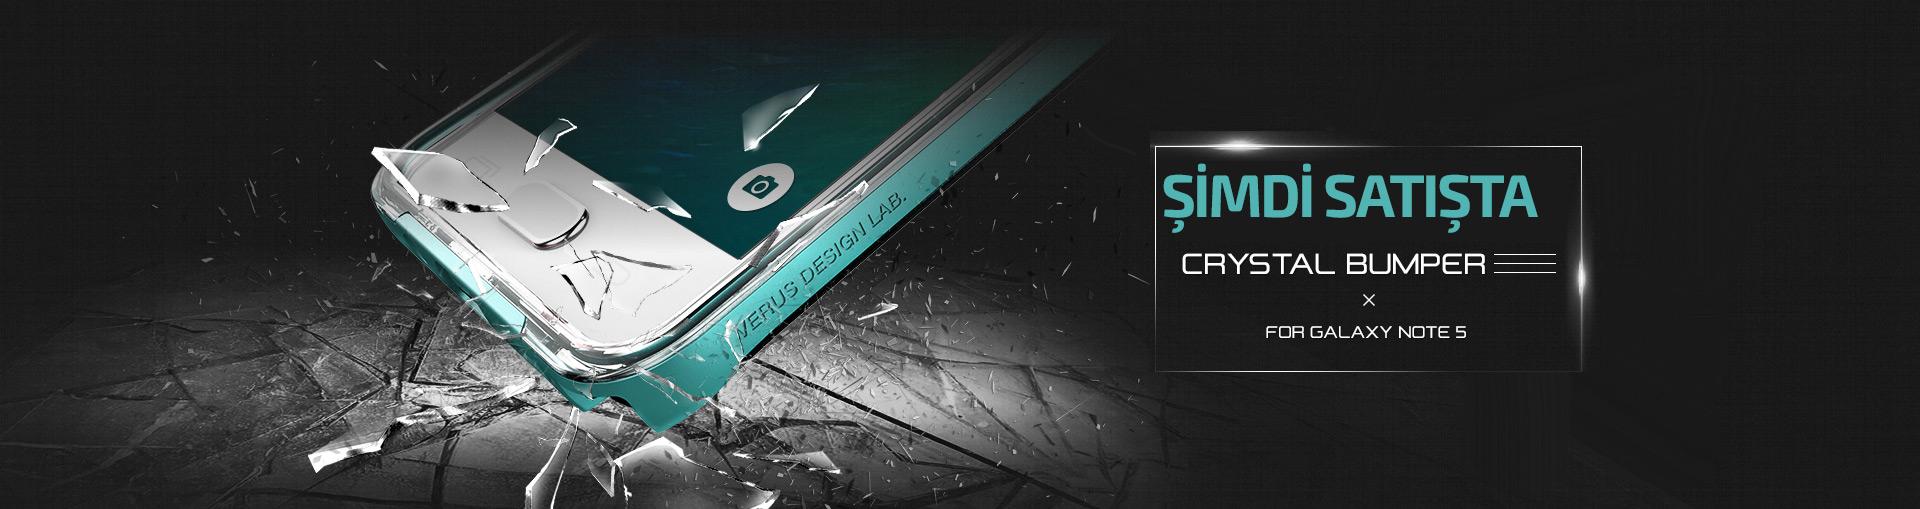 Galaxy Note 5 High Pro shield